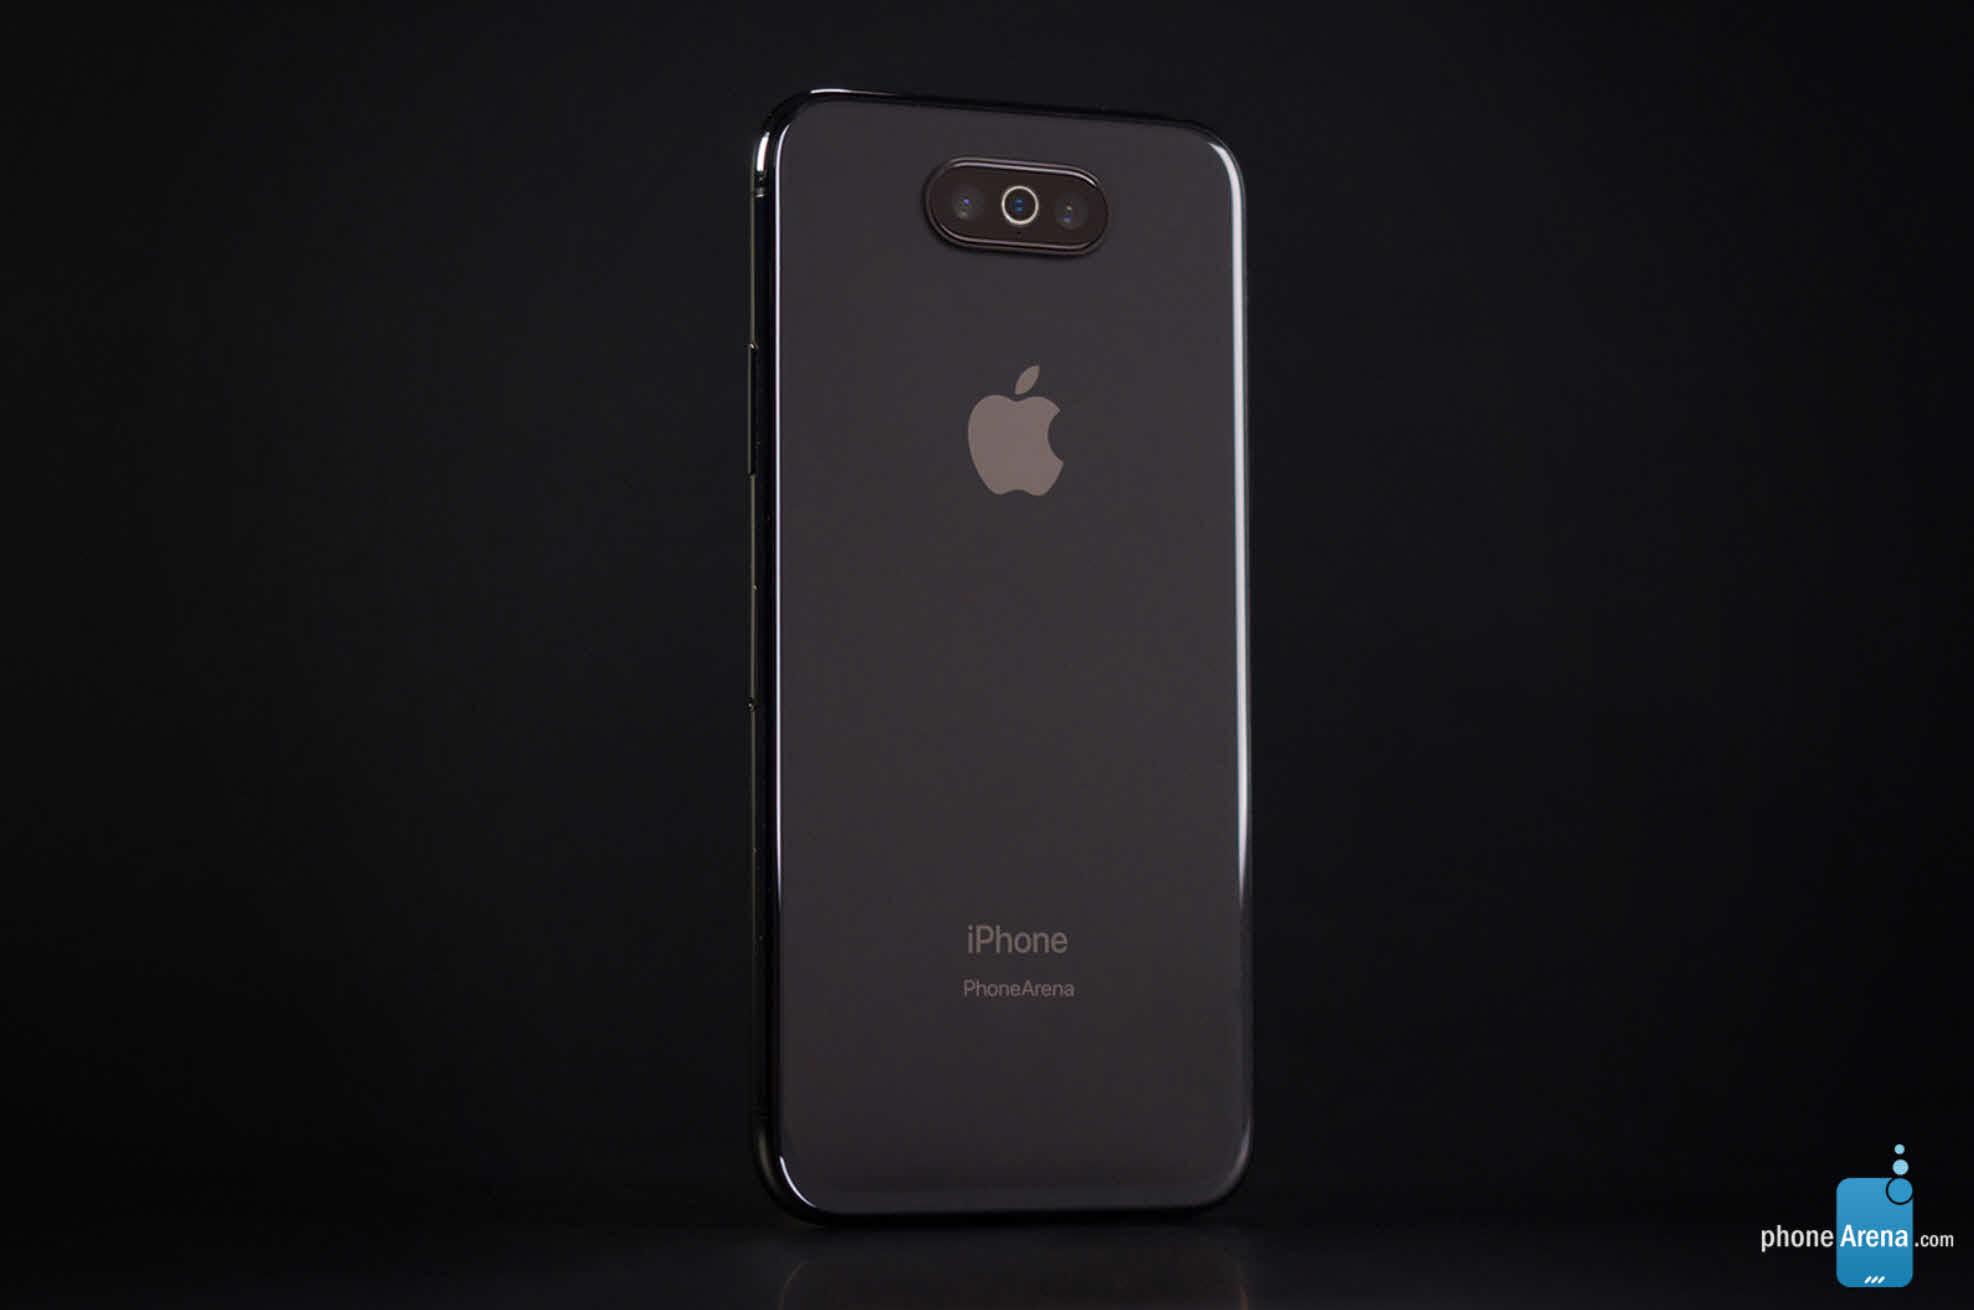 Phonearena Iphone Xi Ios 13 Darkmode Render Img 1 4